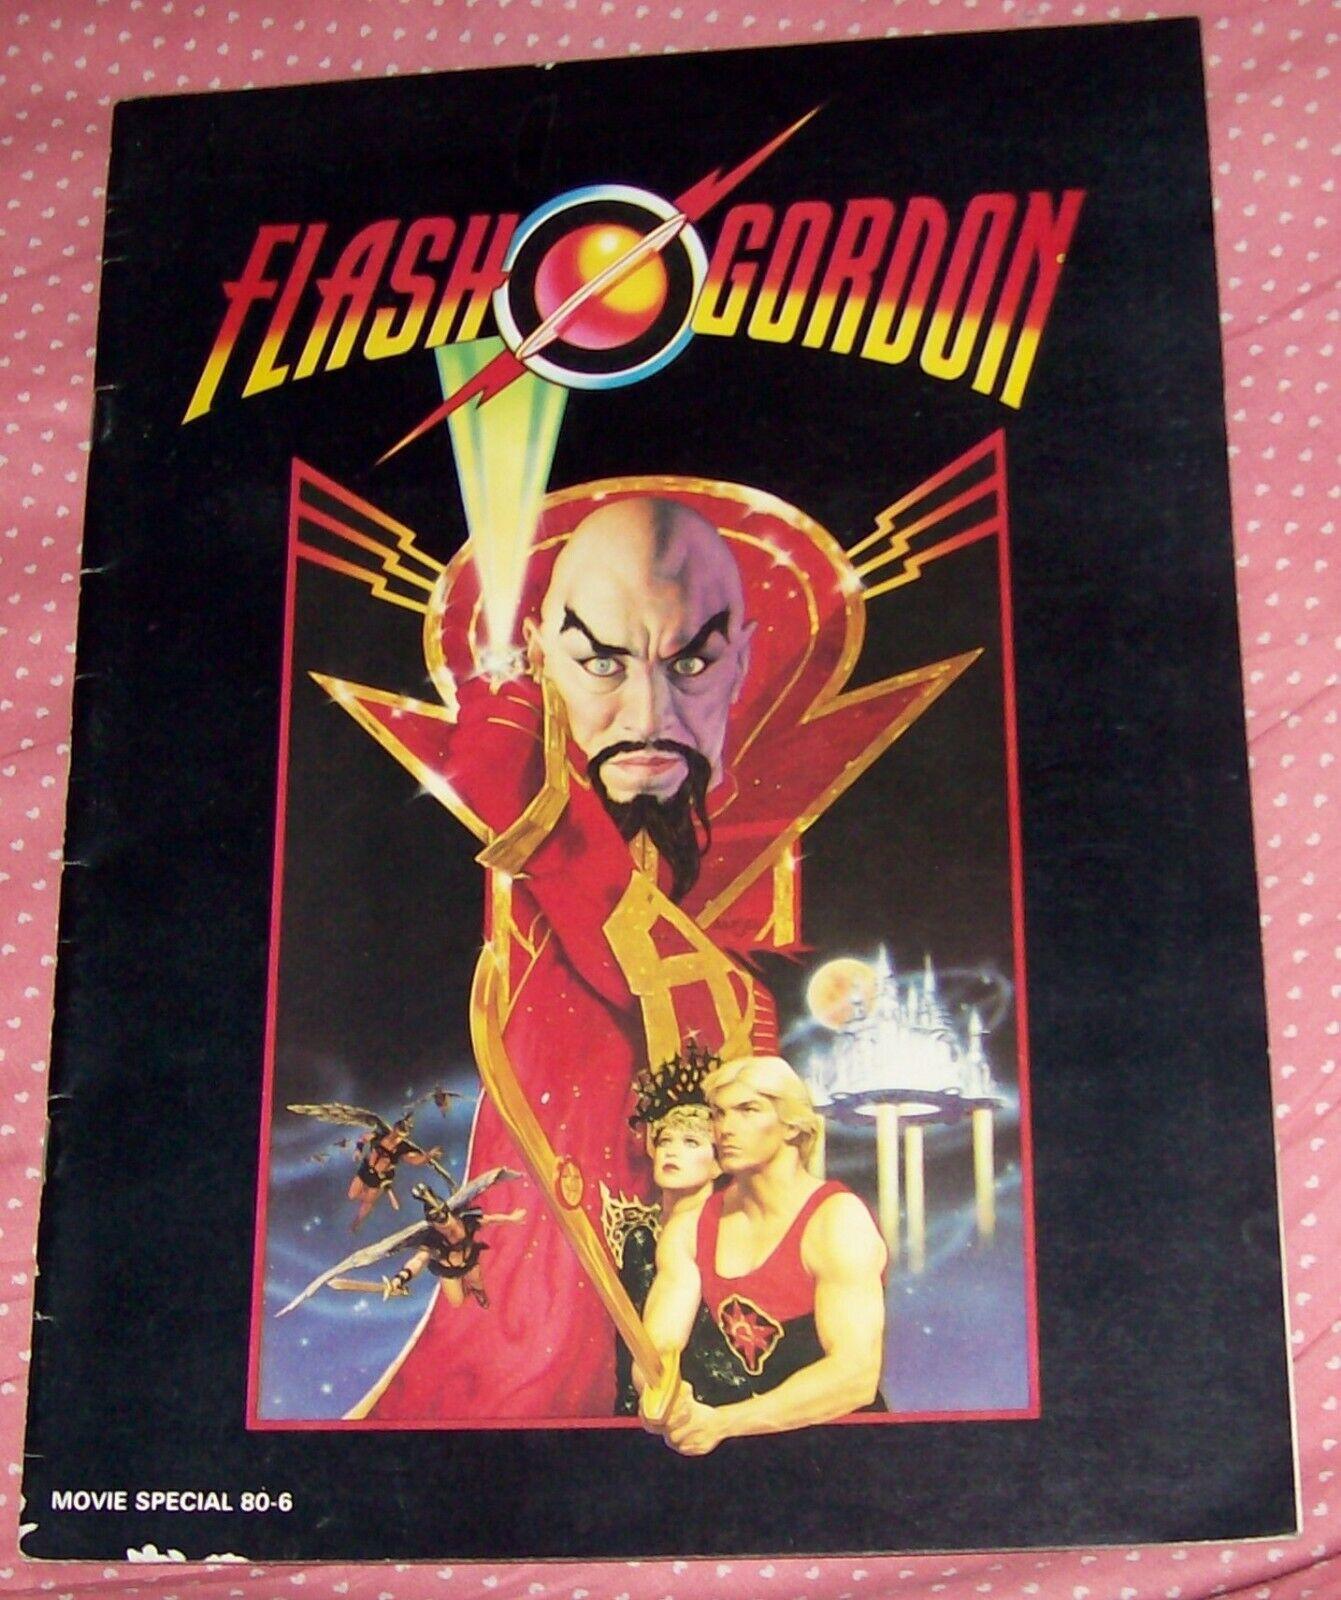 FLASH GORDON 1980 MOVIE PROGRAM - $12.99